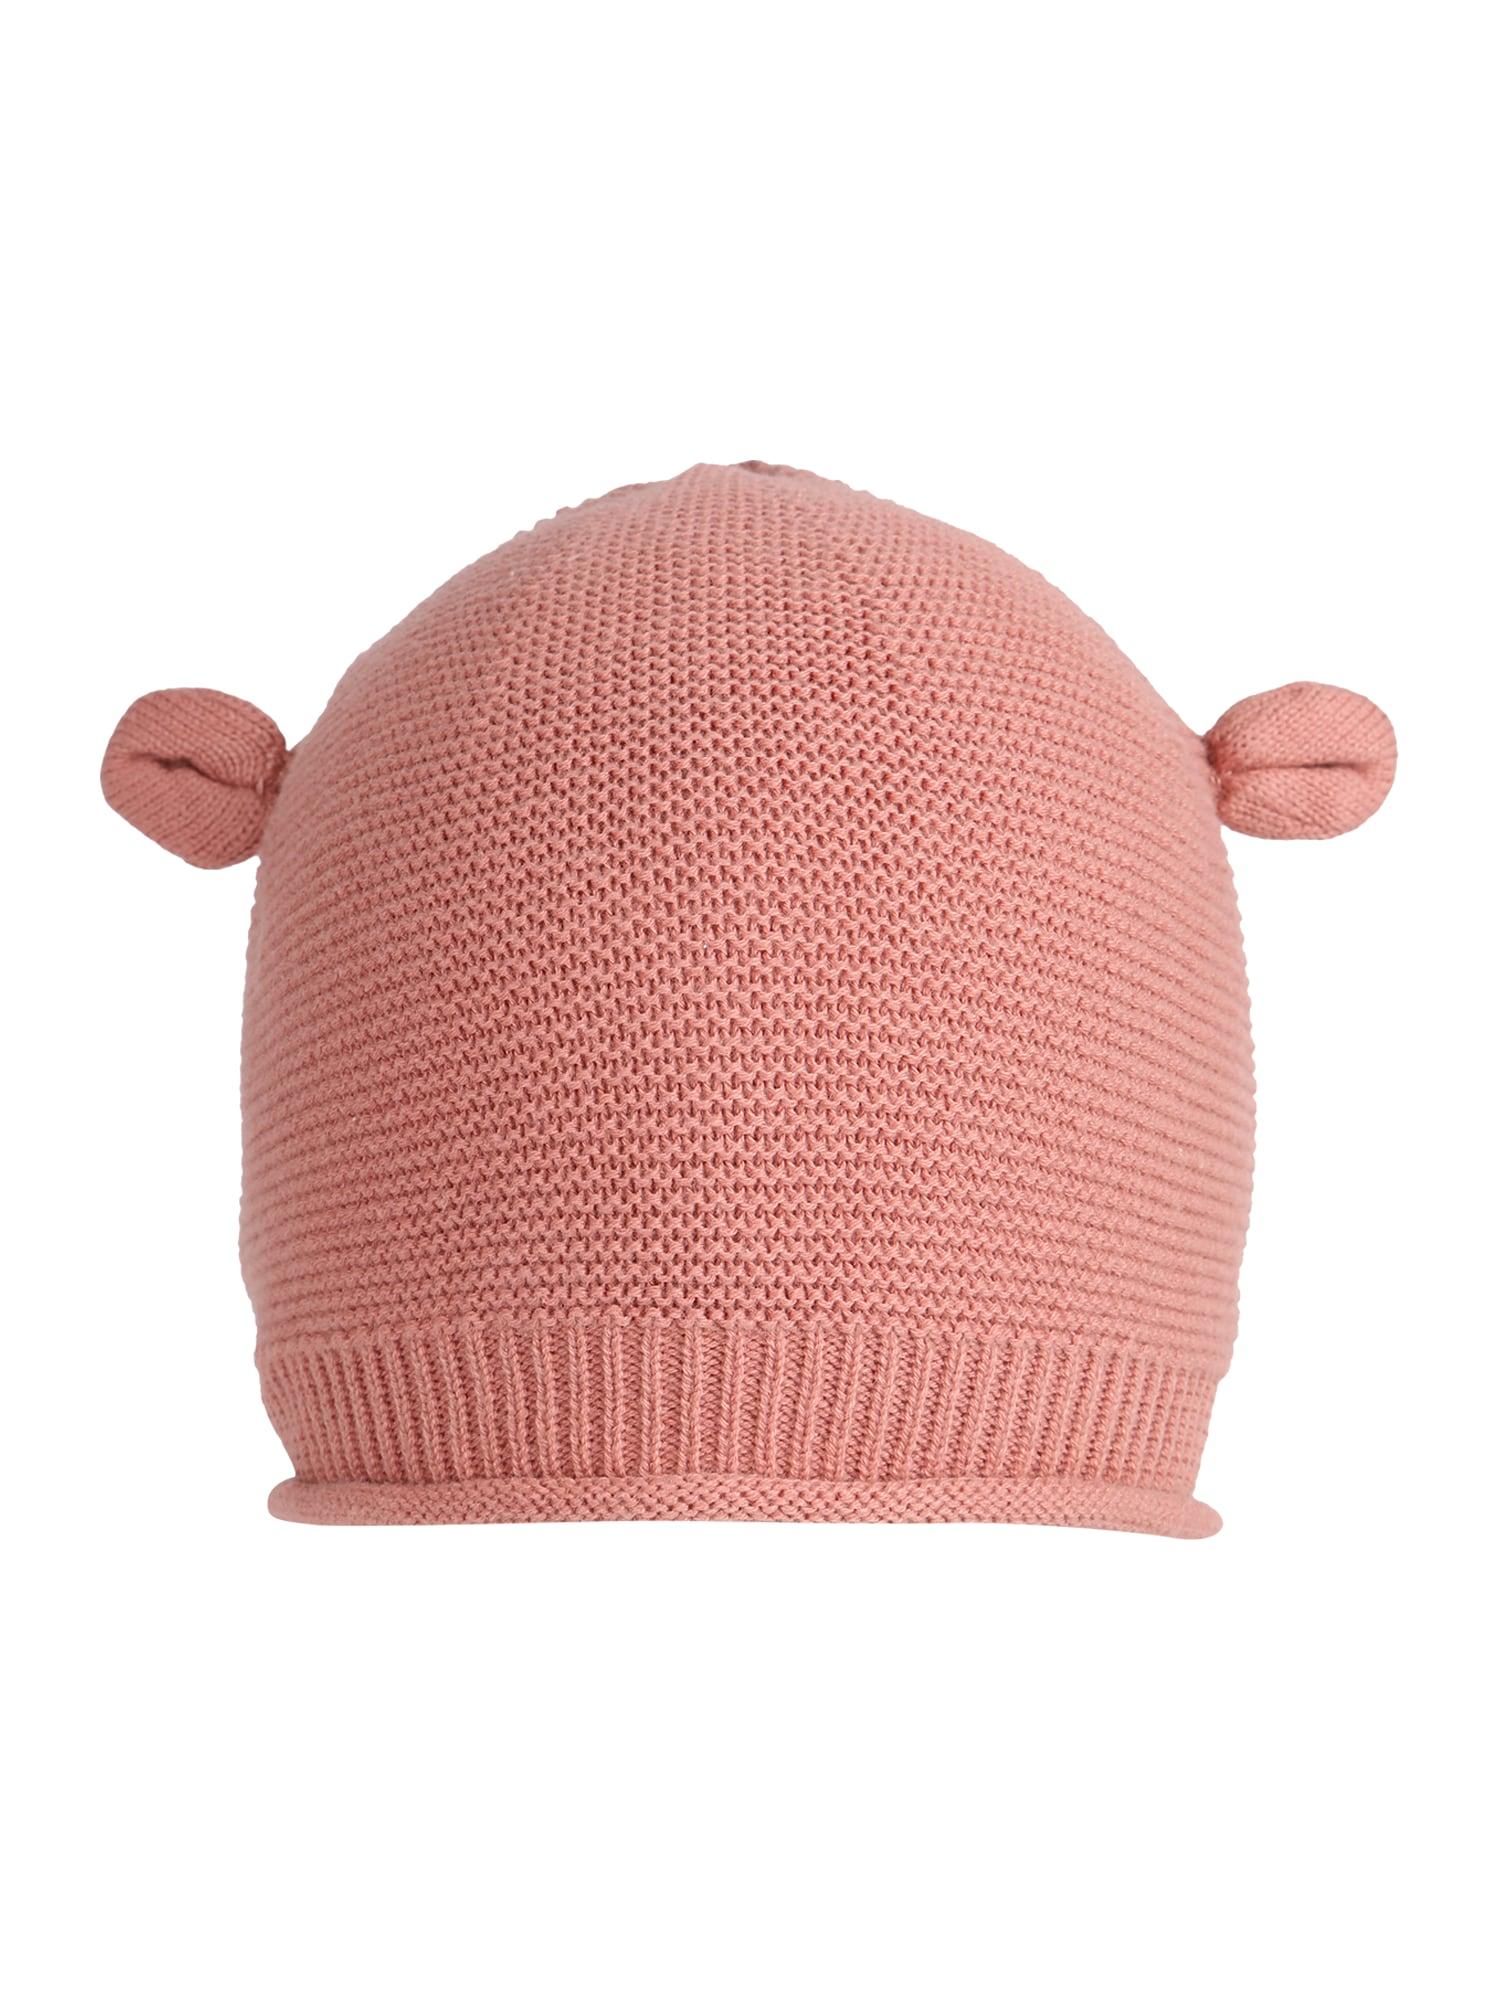 Hust & Claire Megzta kepurė 'Feri' ryškiai rožinė spalva